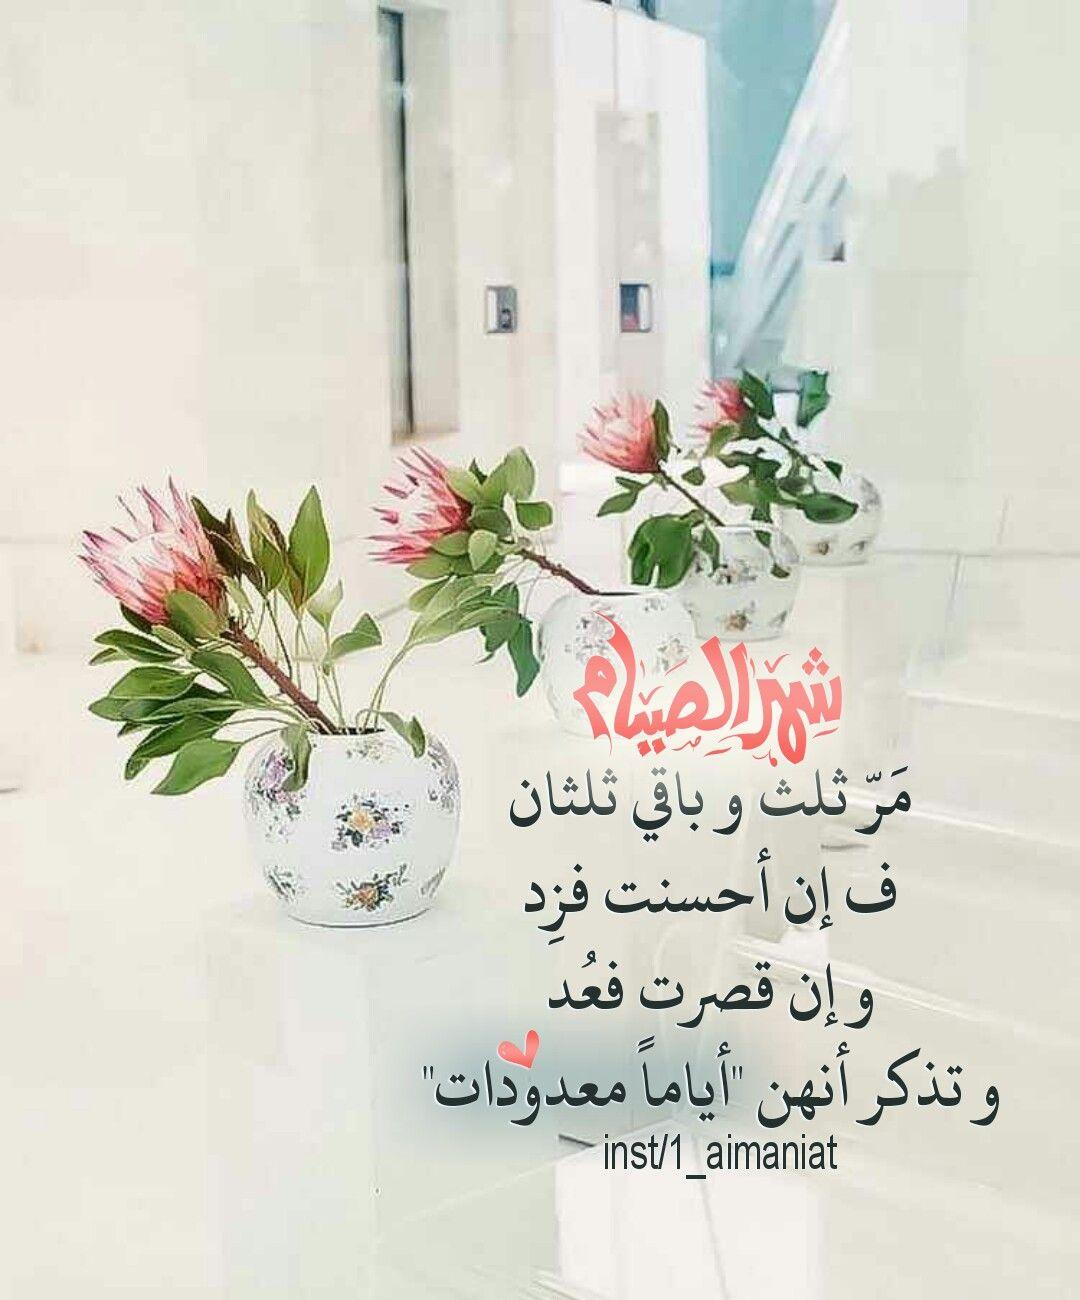 Pin By Saja Khalid On رمضان كريم Backgrounds Phone Wallpapers Ramadan Phone Wallpaper